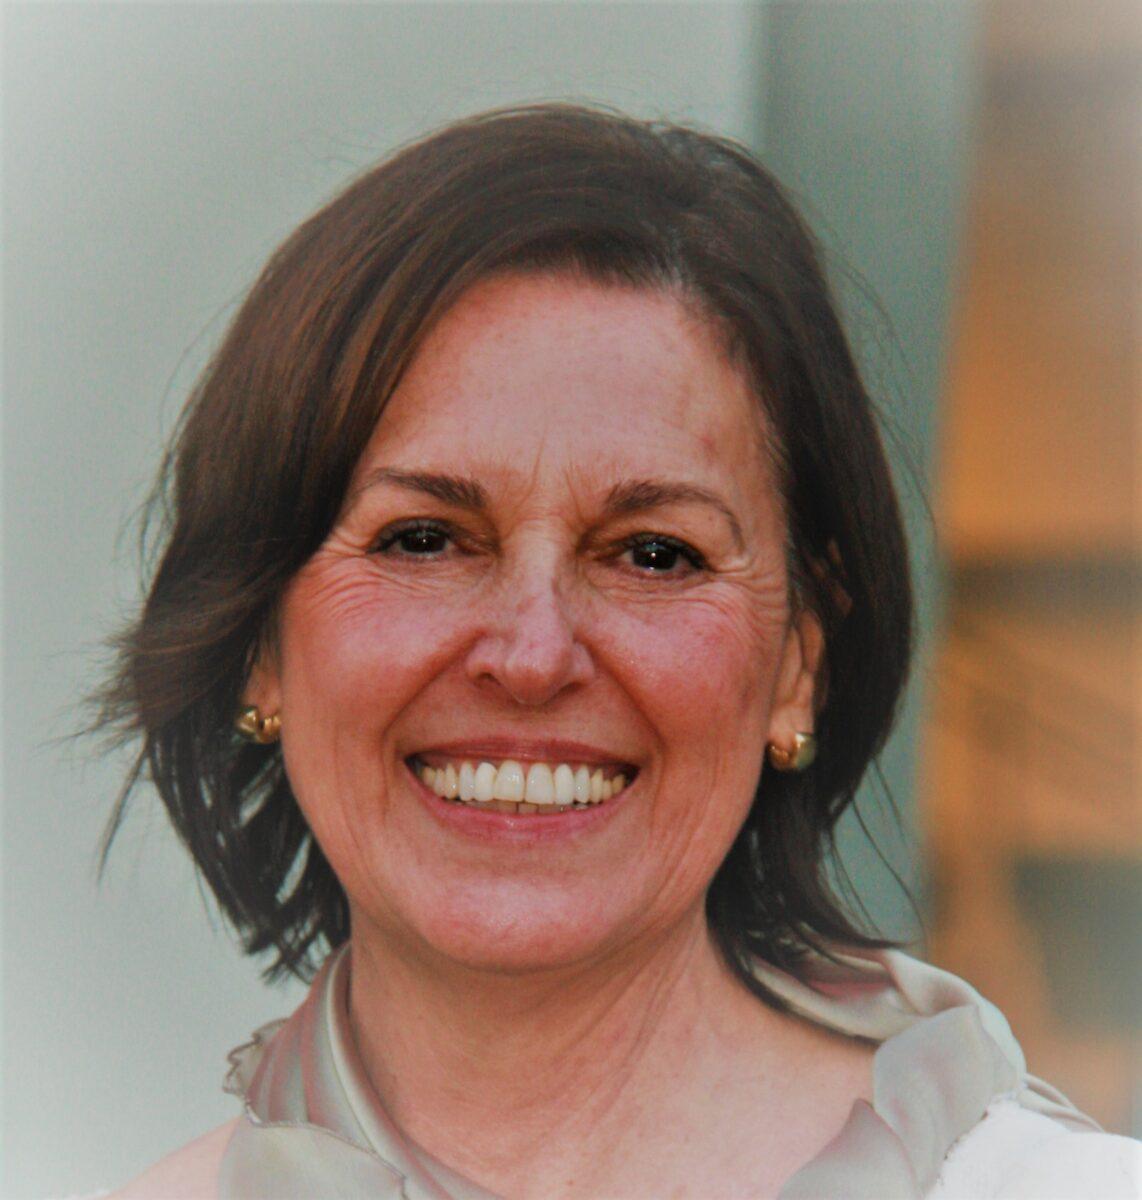 Jeanne van Rooij portret